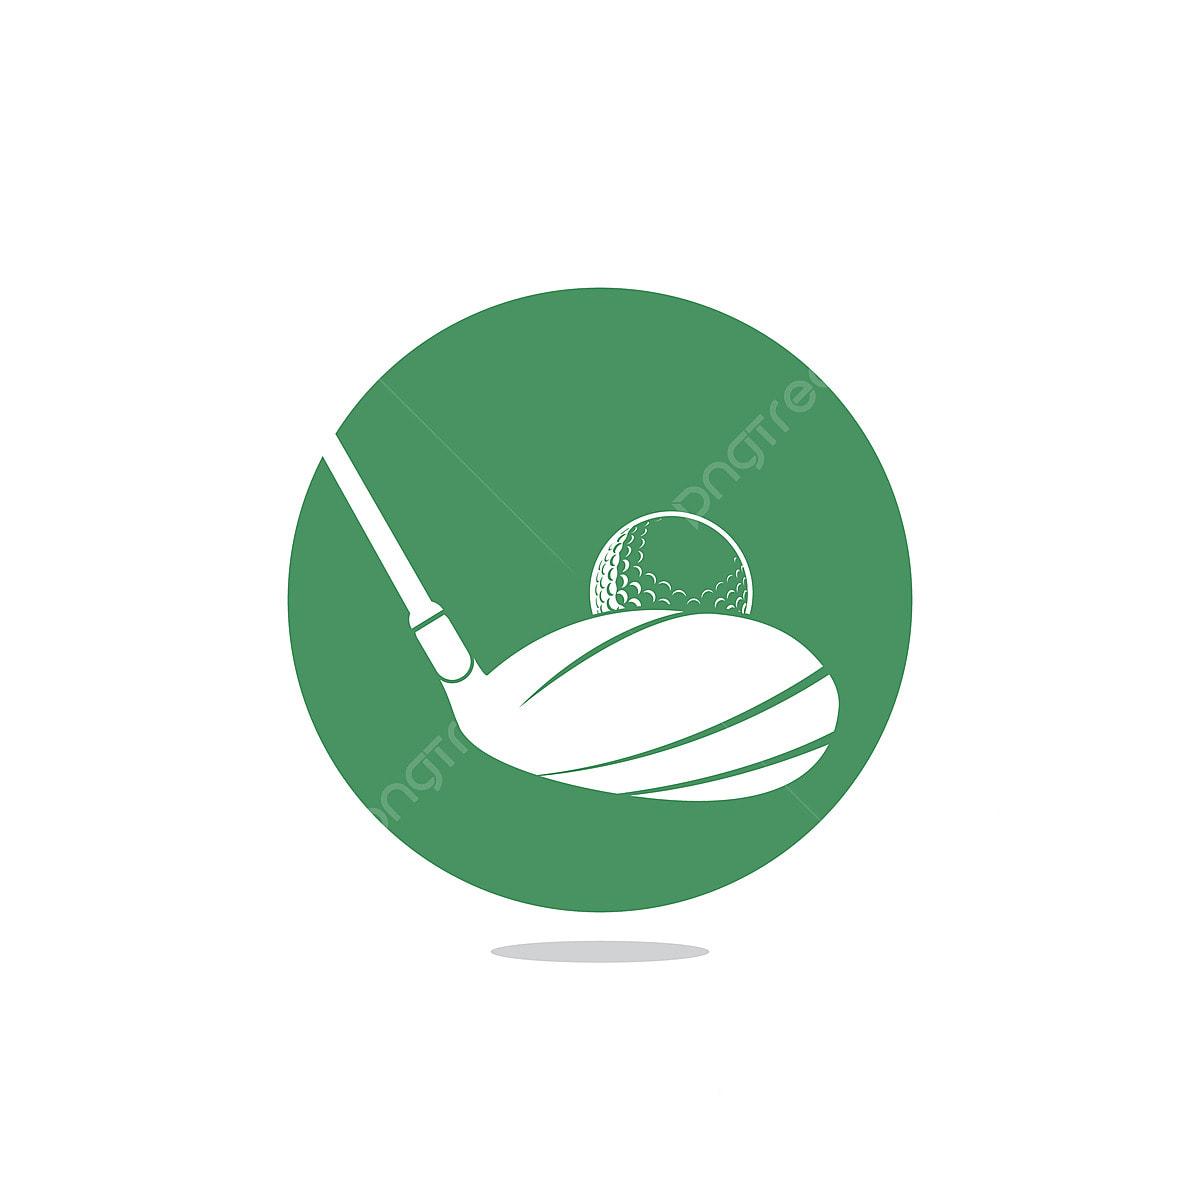 Golf Club Vector Logo Design Golf Club Inspiration Logo Design Template For Free Download On Pngtree